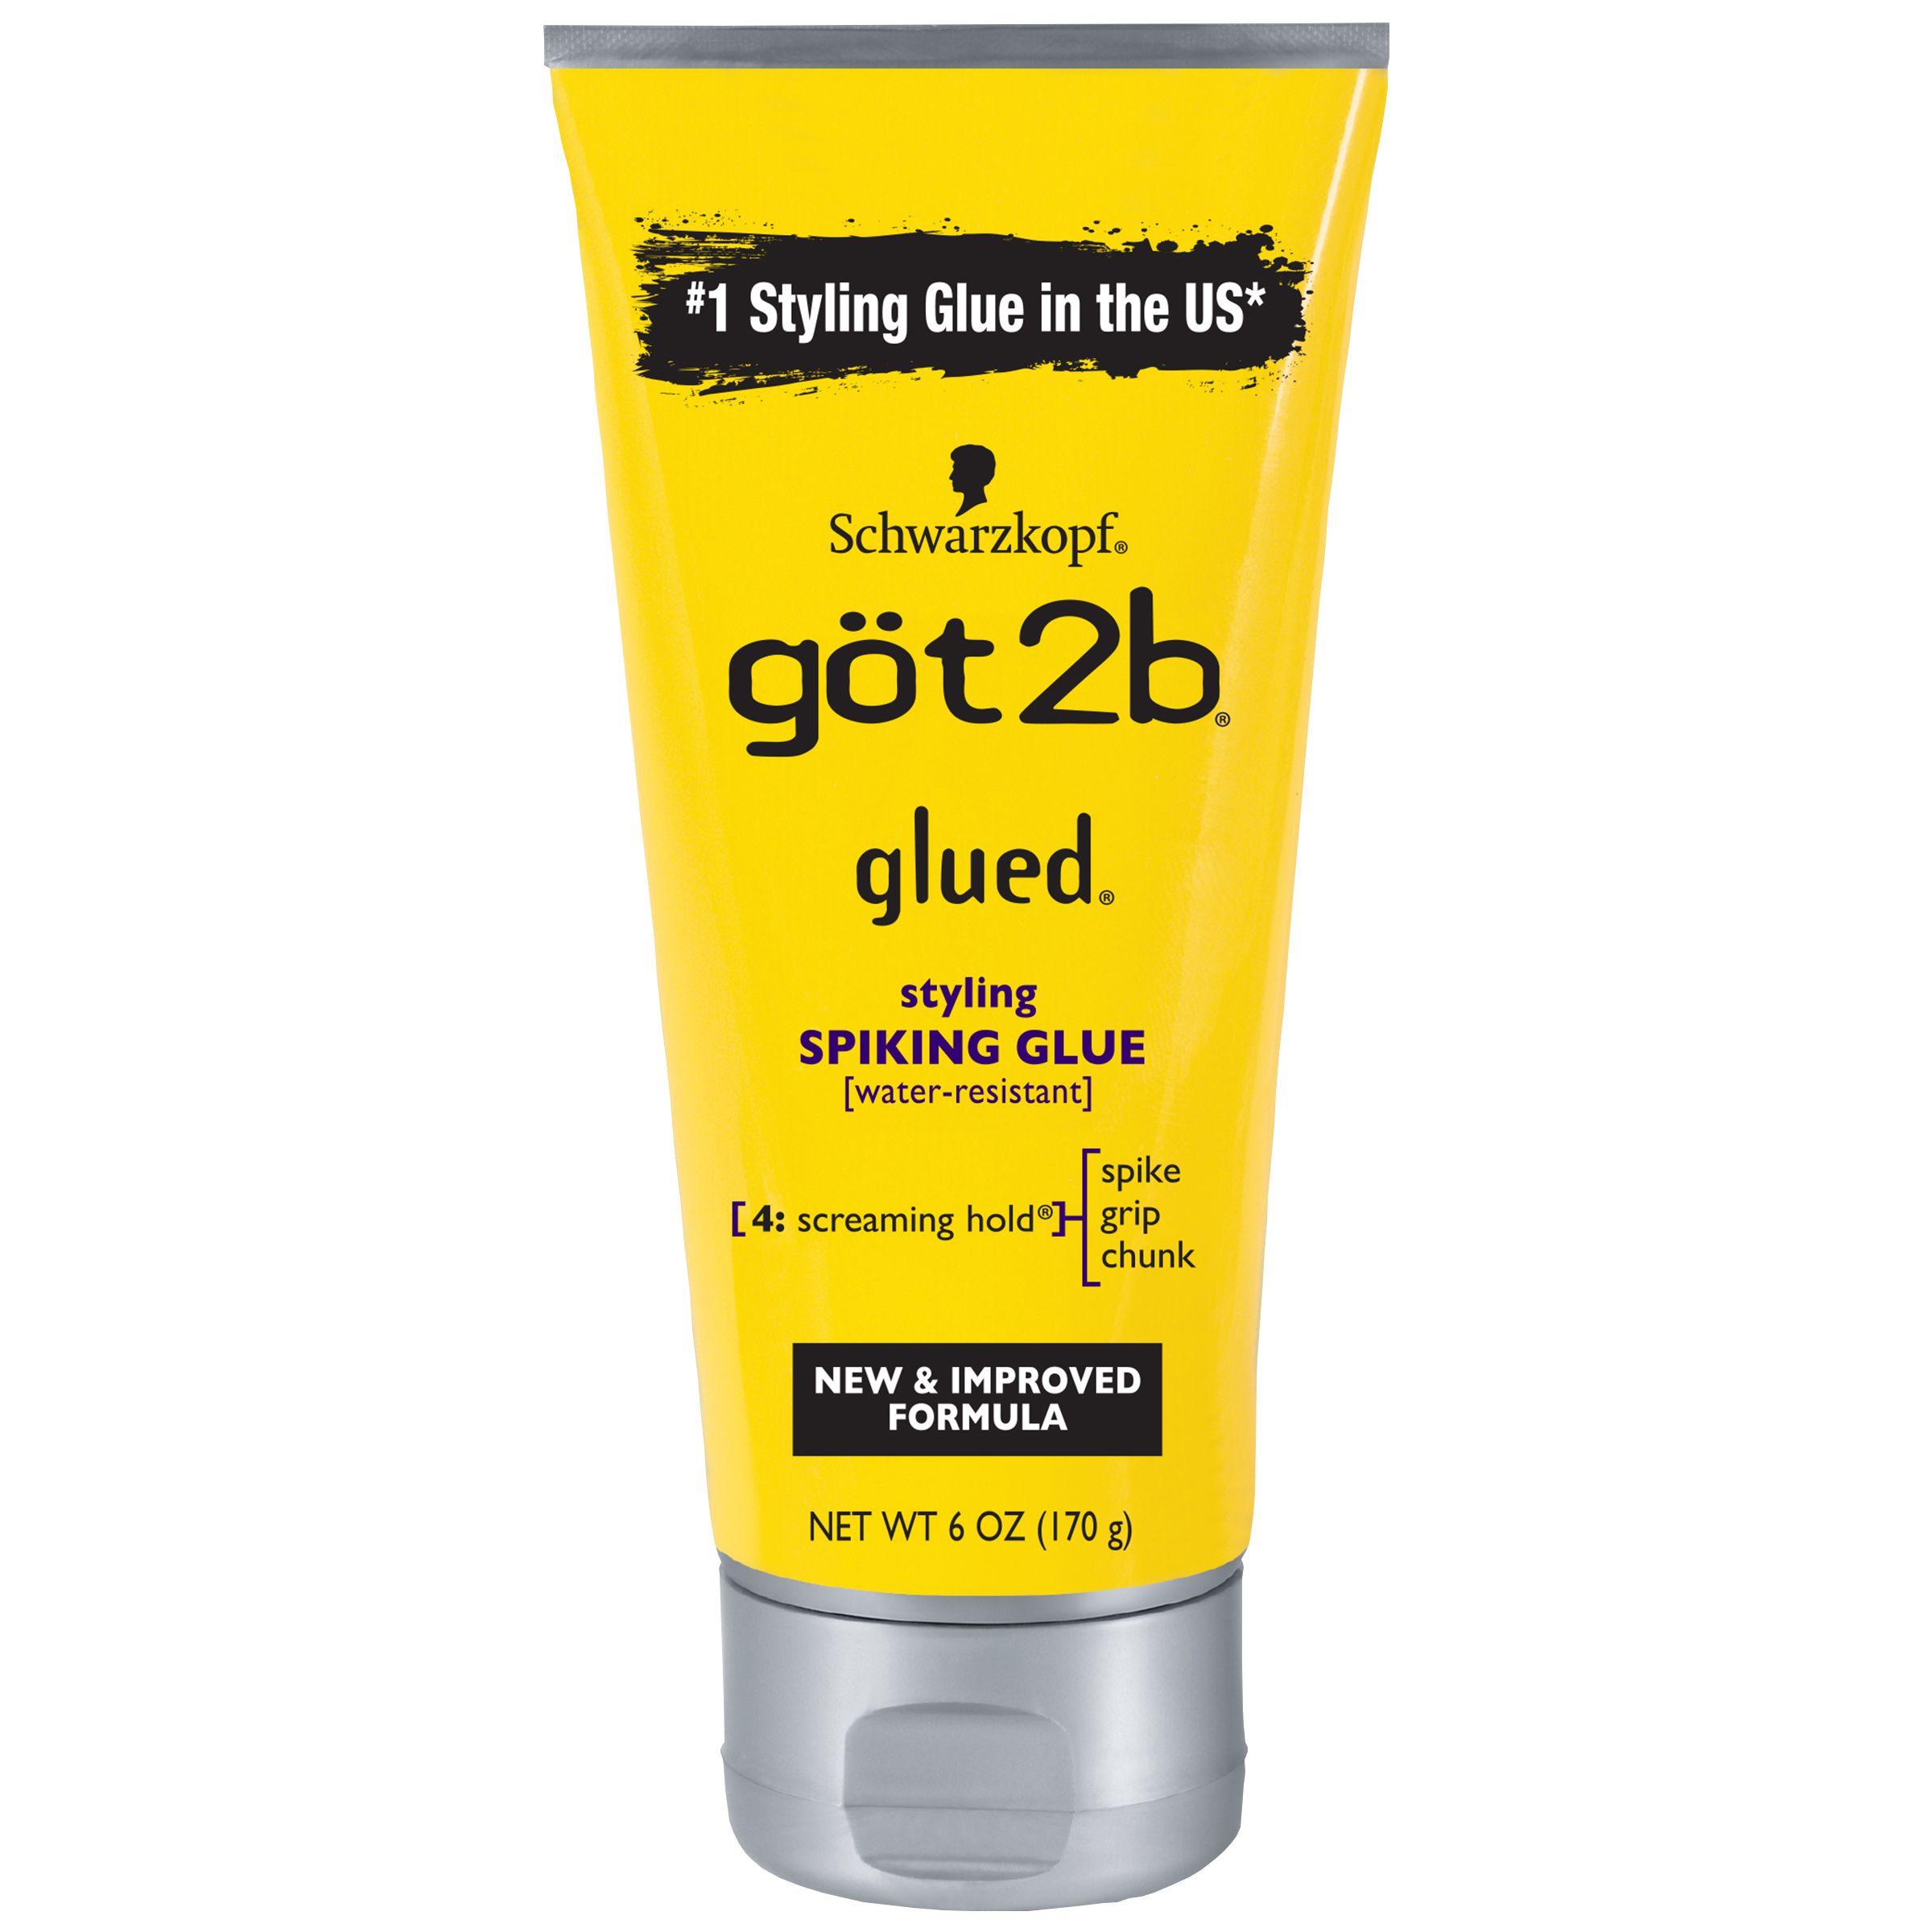 Got2b Glued Styling Spiking Hair Glue 6 Ounce Styling Glued Got2b Hair Glue Got2b Glued Got2b